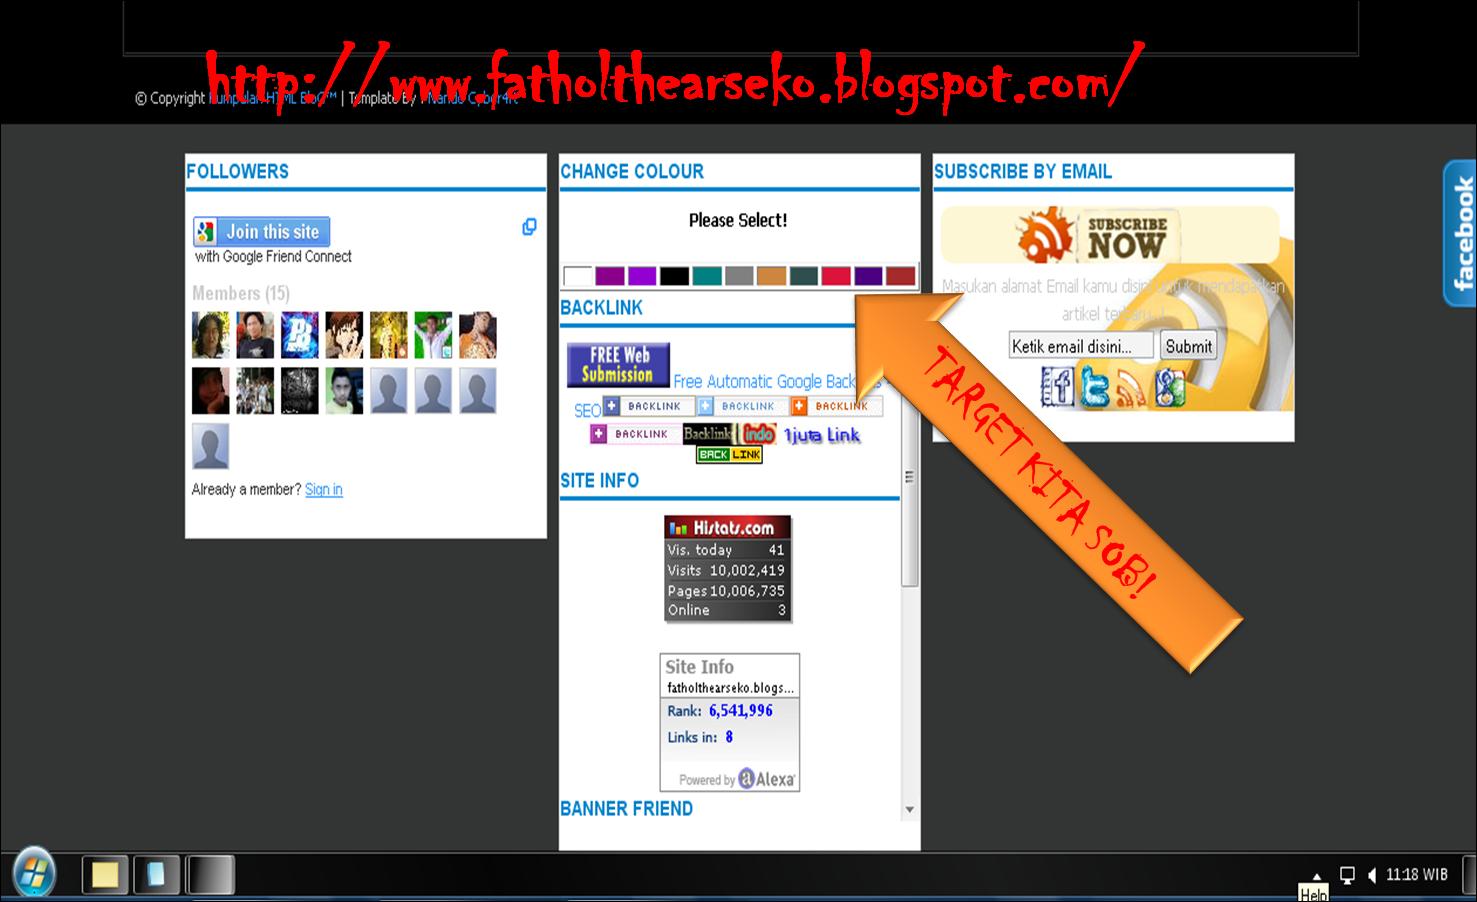 membuat tombol ganti warna backgroun di blog - Damashadi109